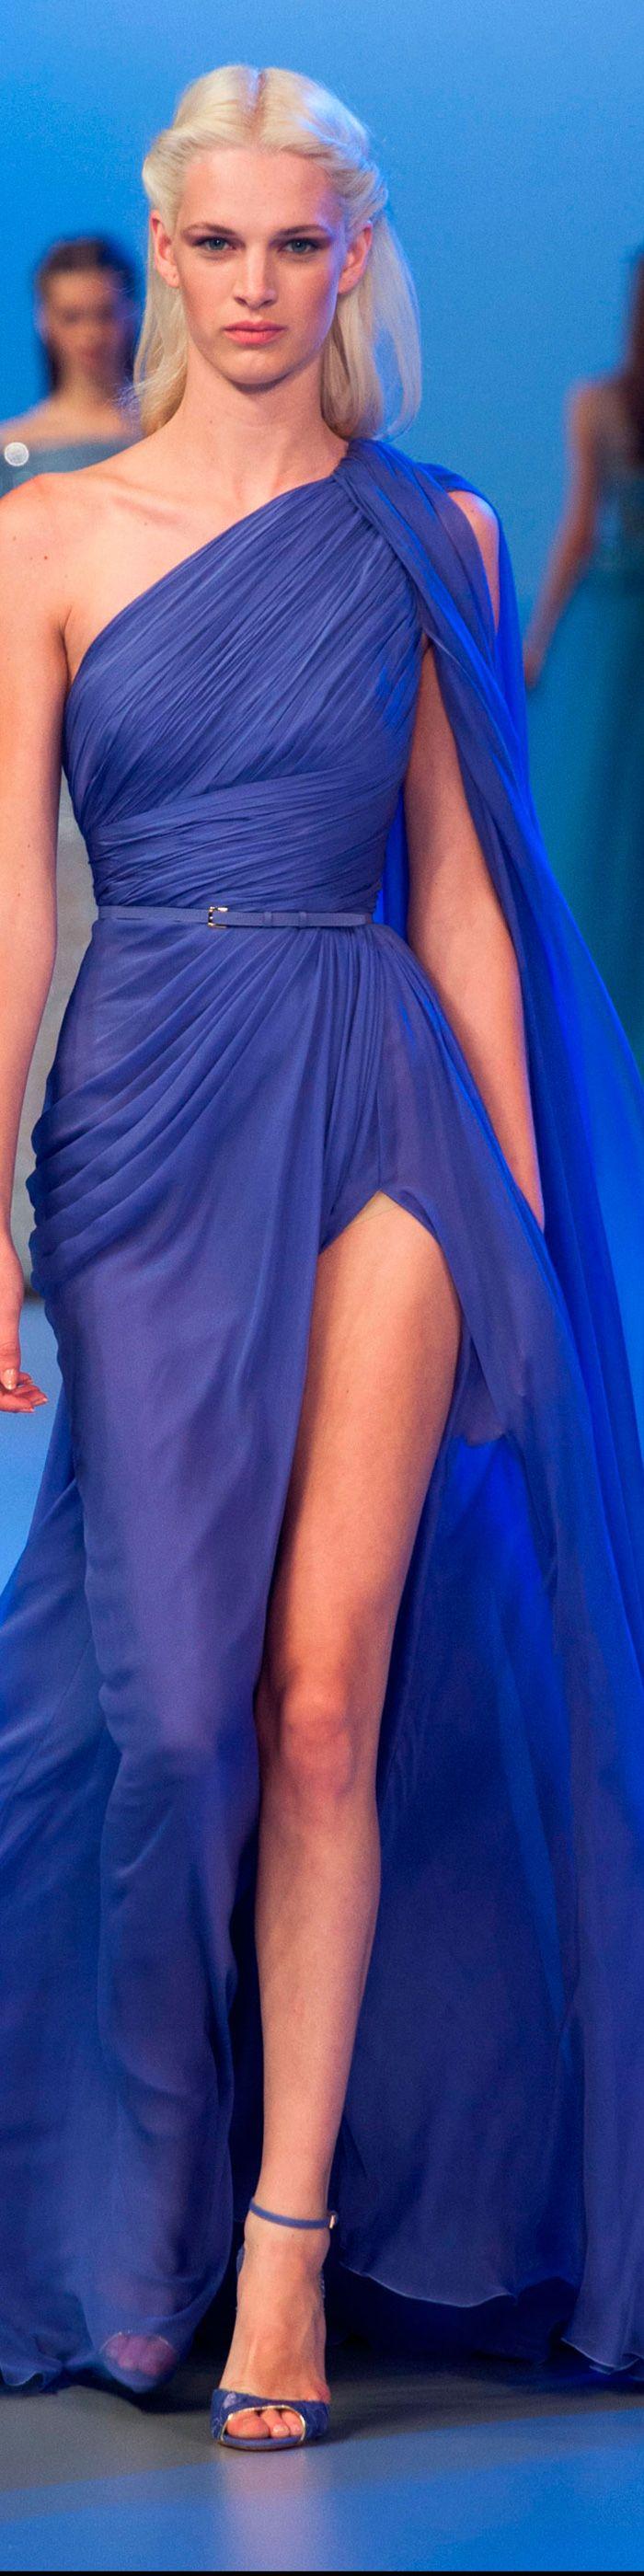 2462 best Gala Galore images on Pinterest | Classy dress, Evening ...